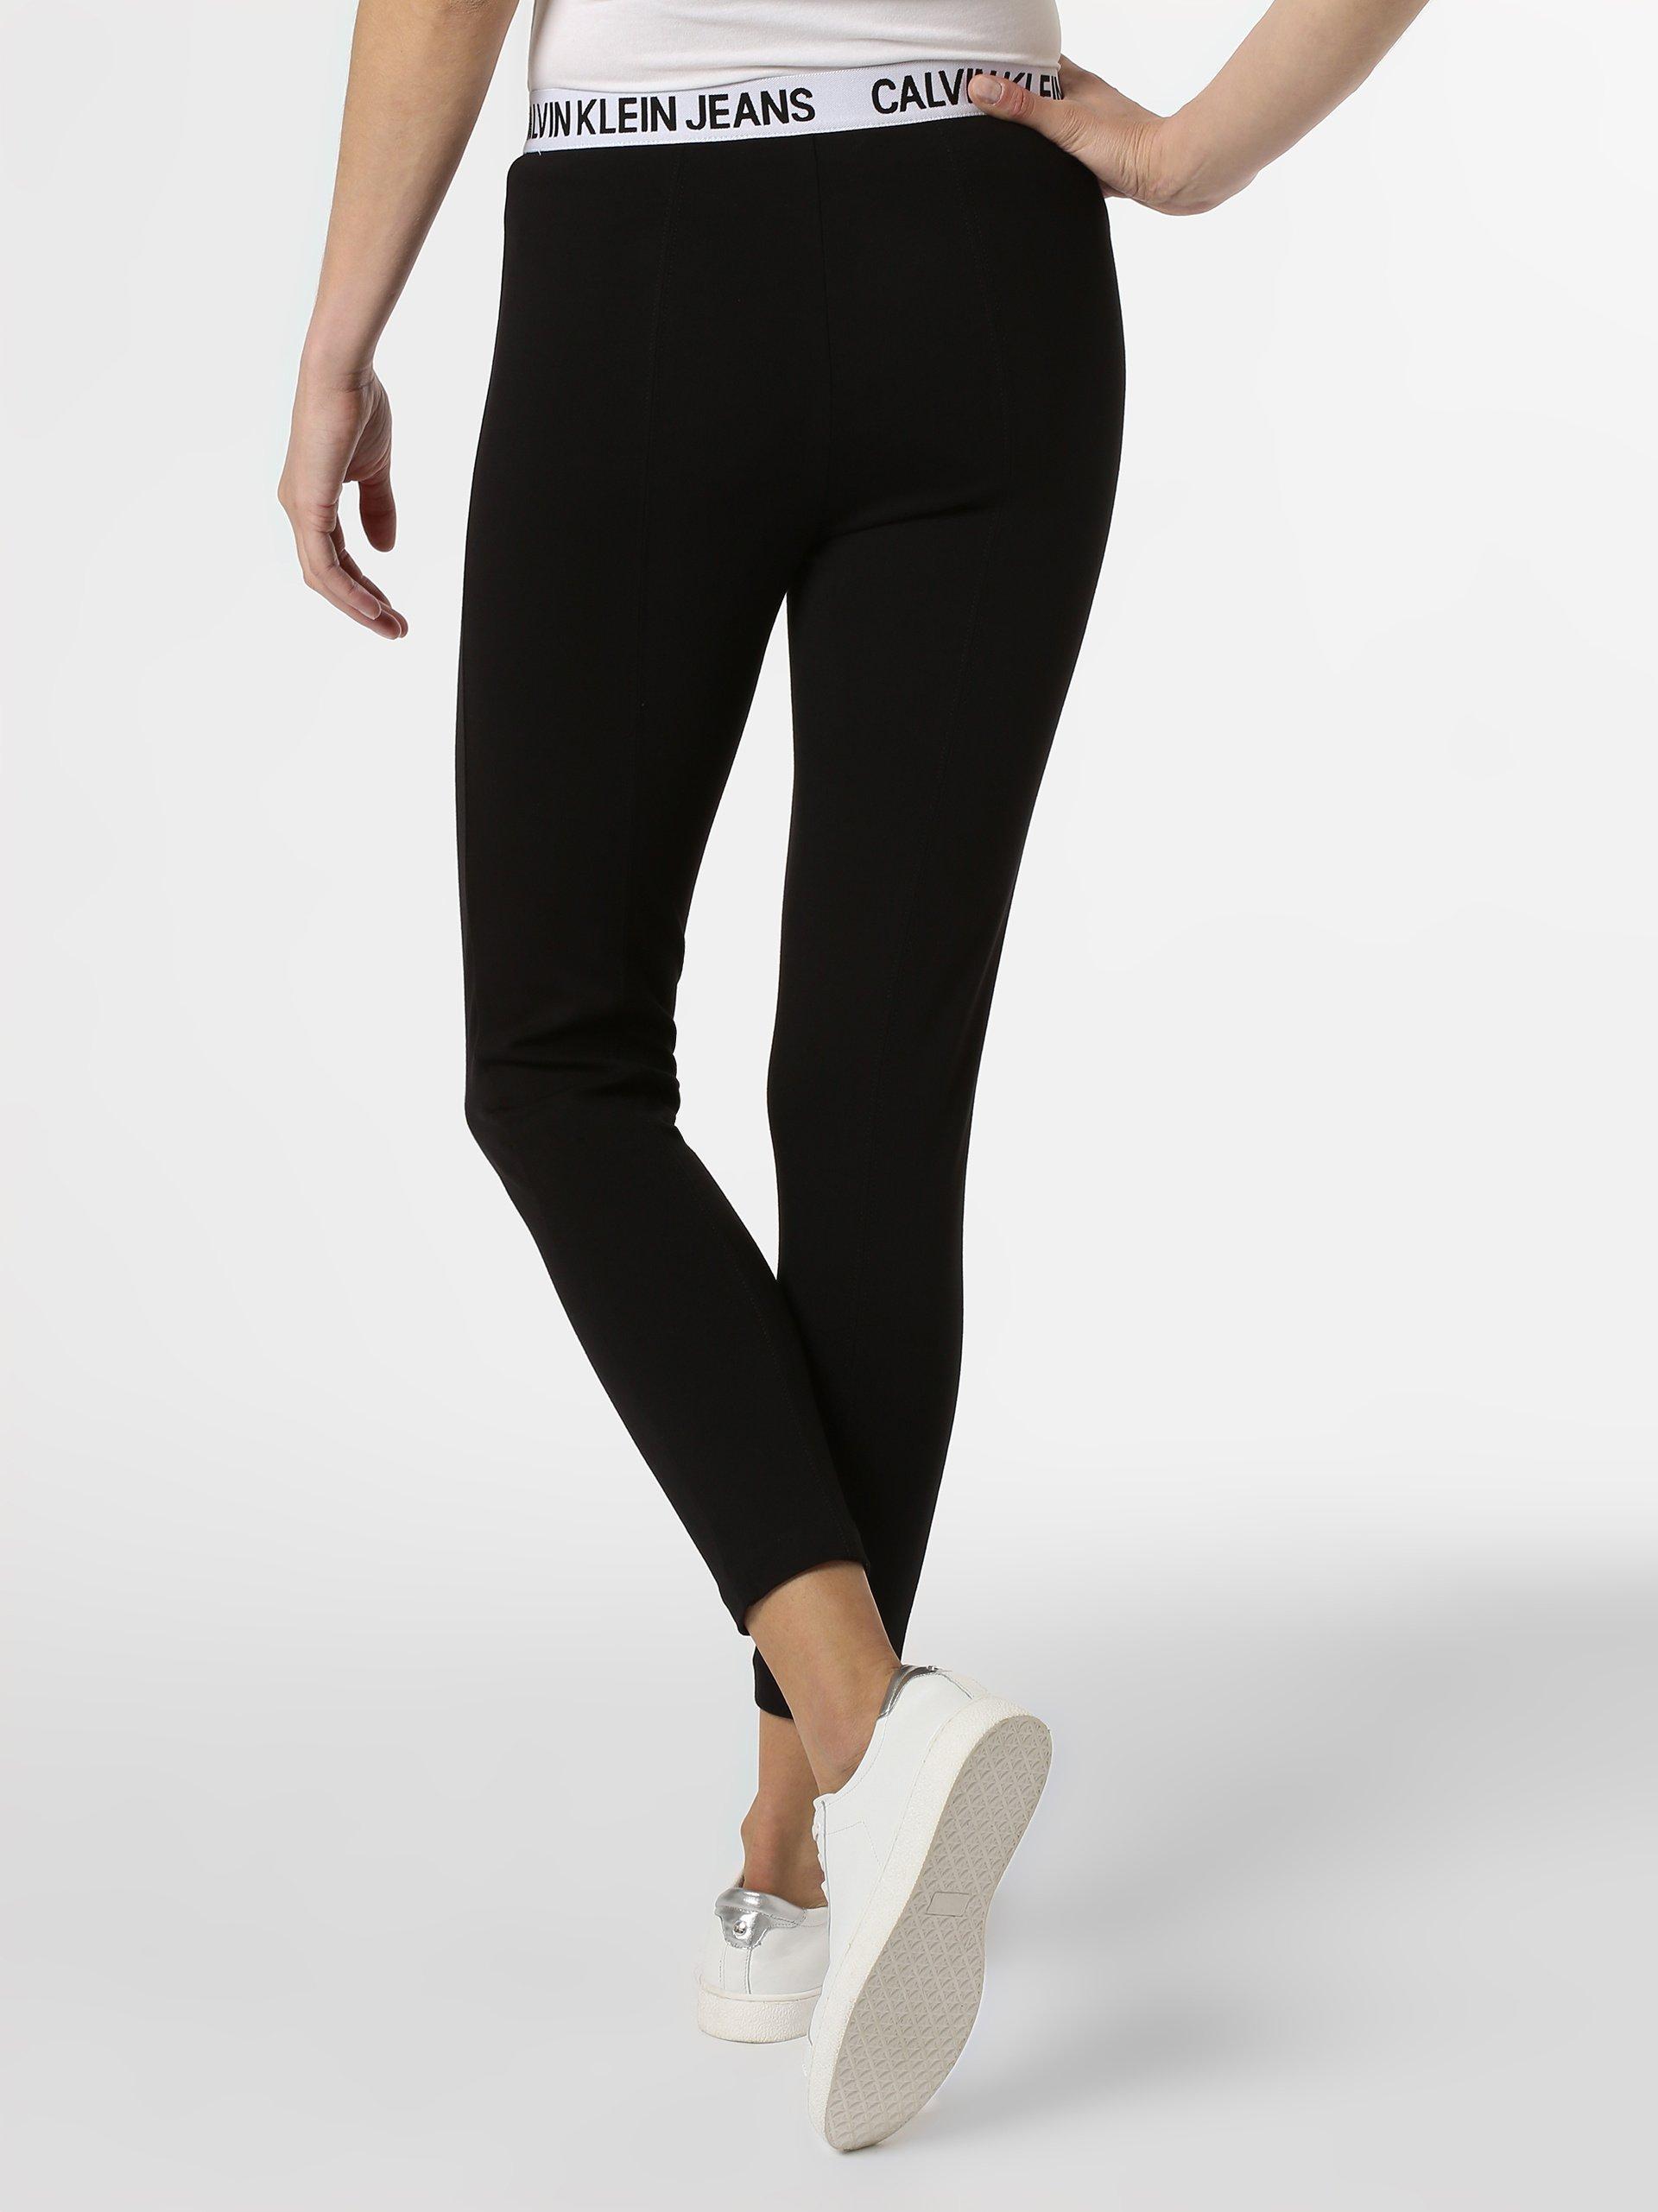 Calvin Klein Jeans Damen Leggings